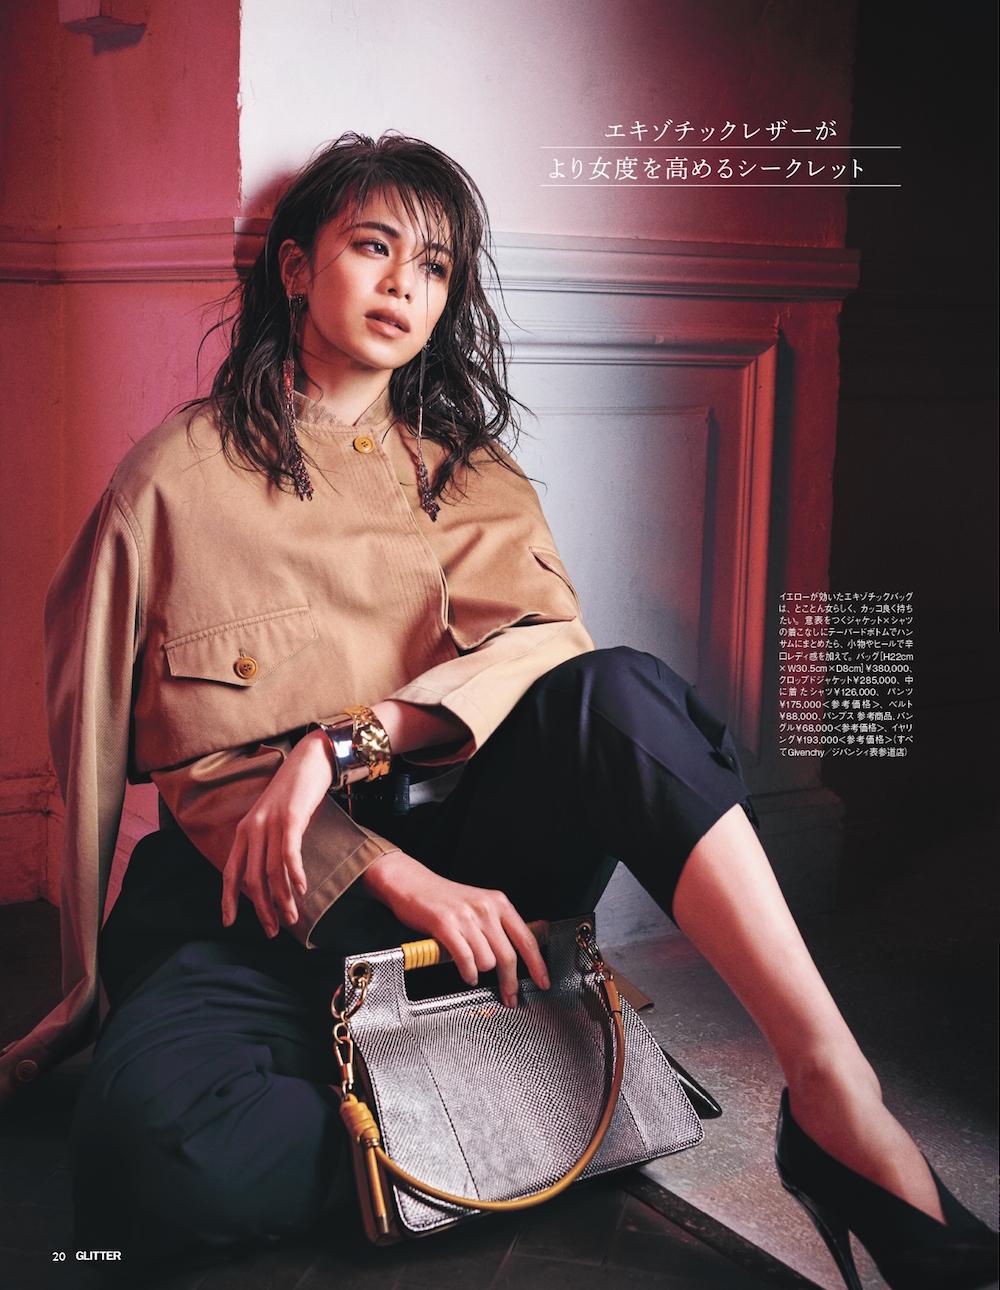 GLITTER – 佐藤晴美 × GIVENCHY  KEN YOSHIMURA HAIR